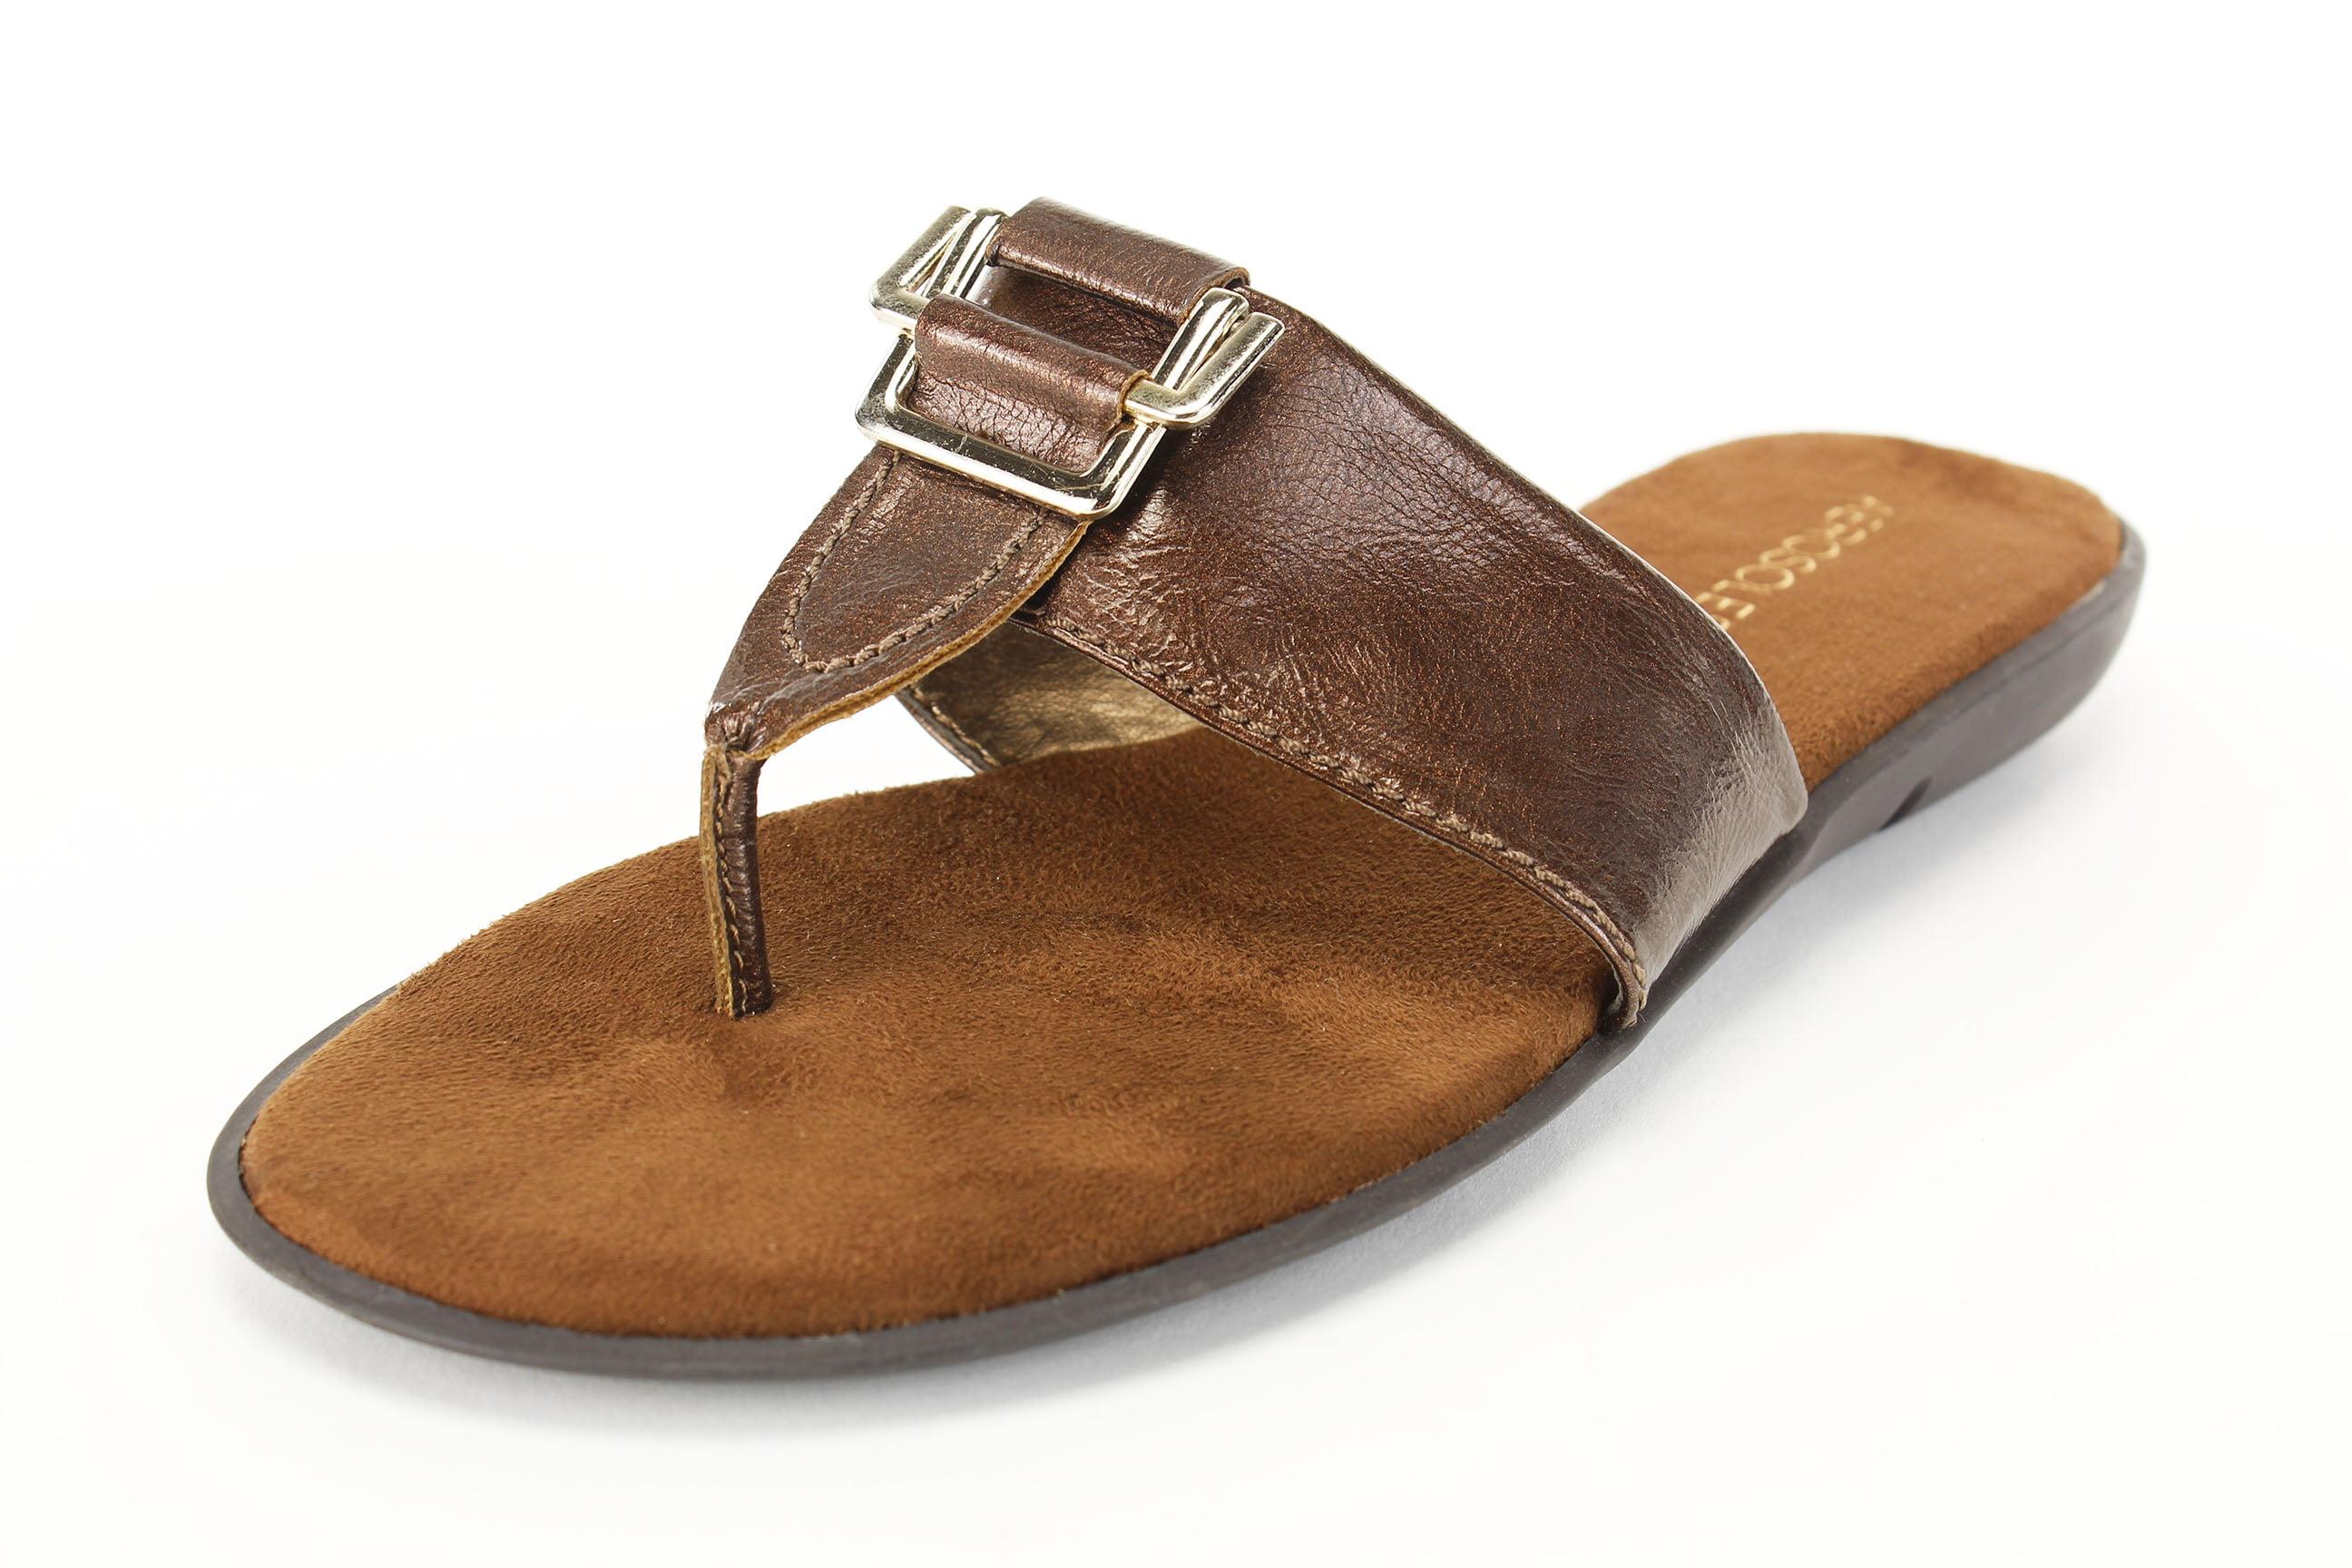 Aerosoles Womens Brown Shoes Size Medium (B, M) by